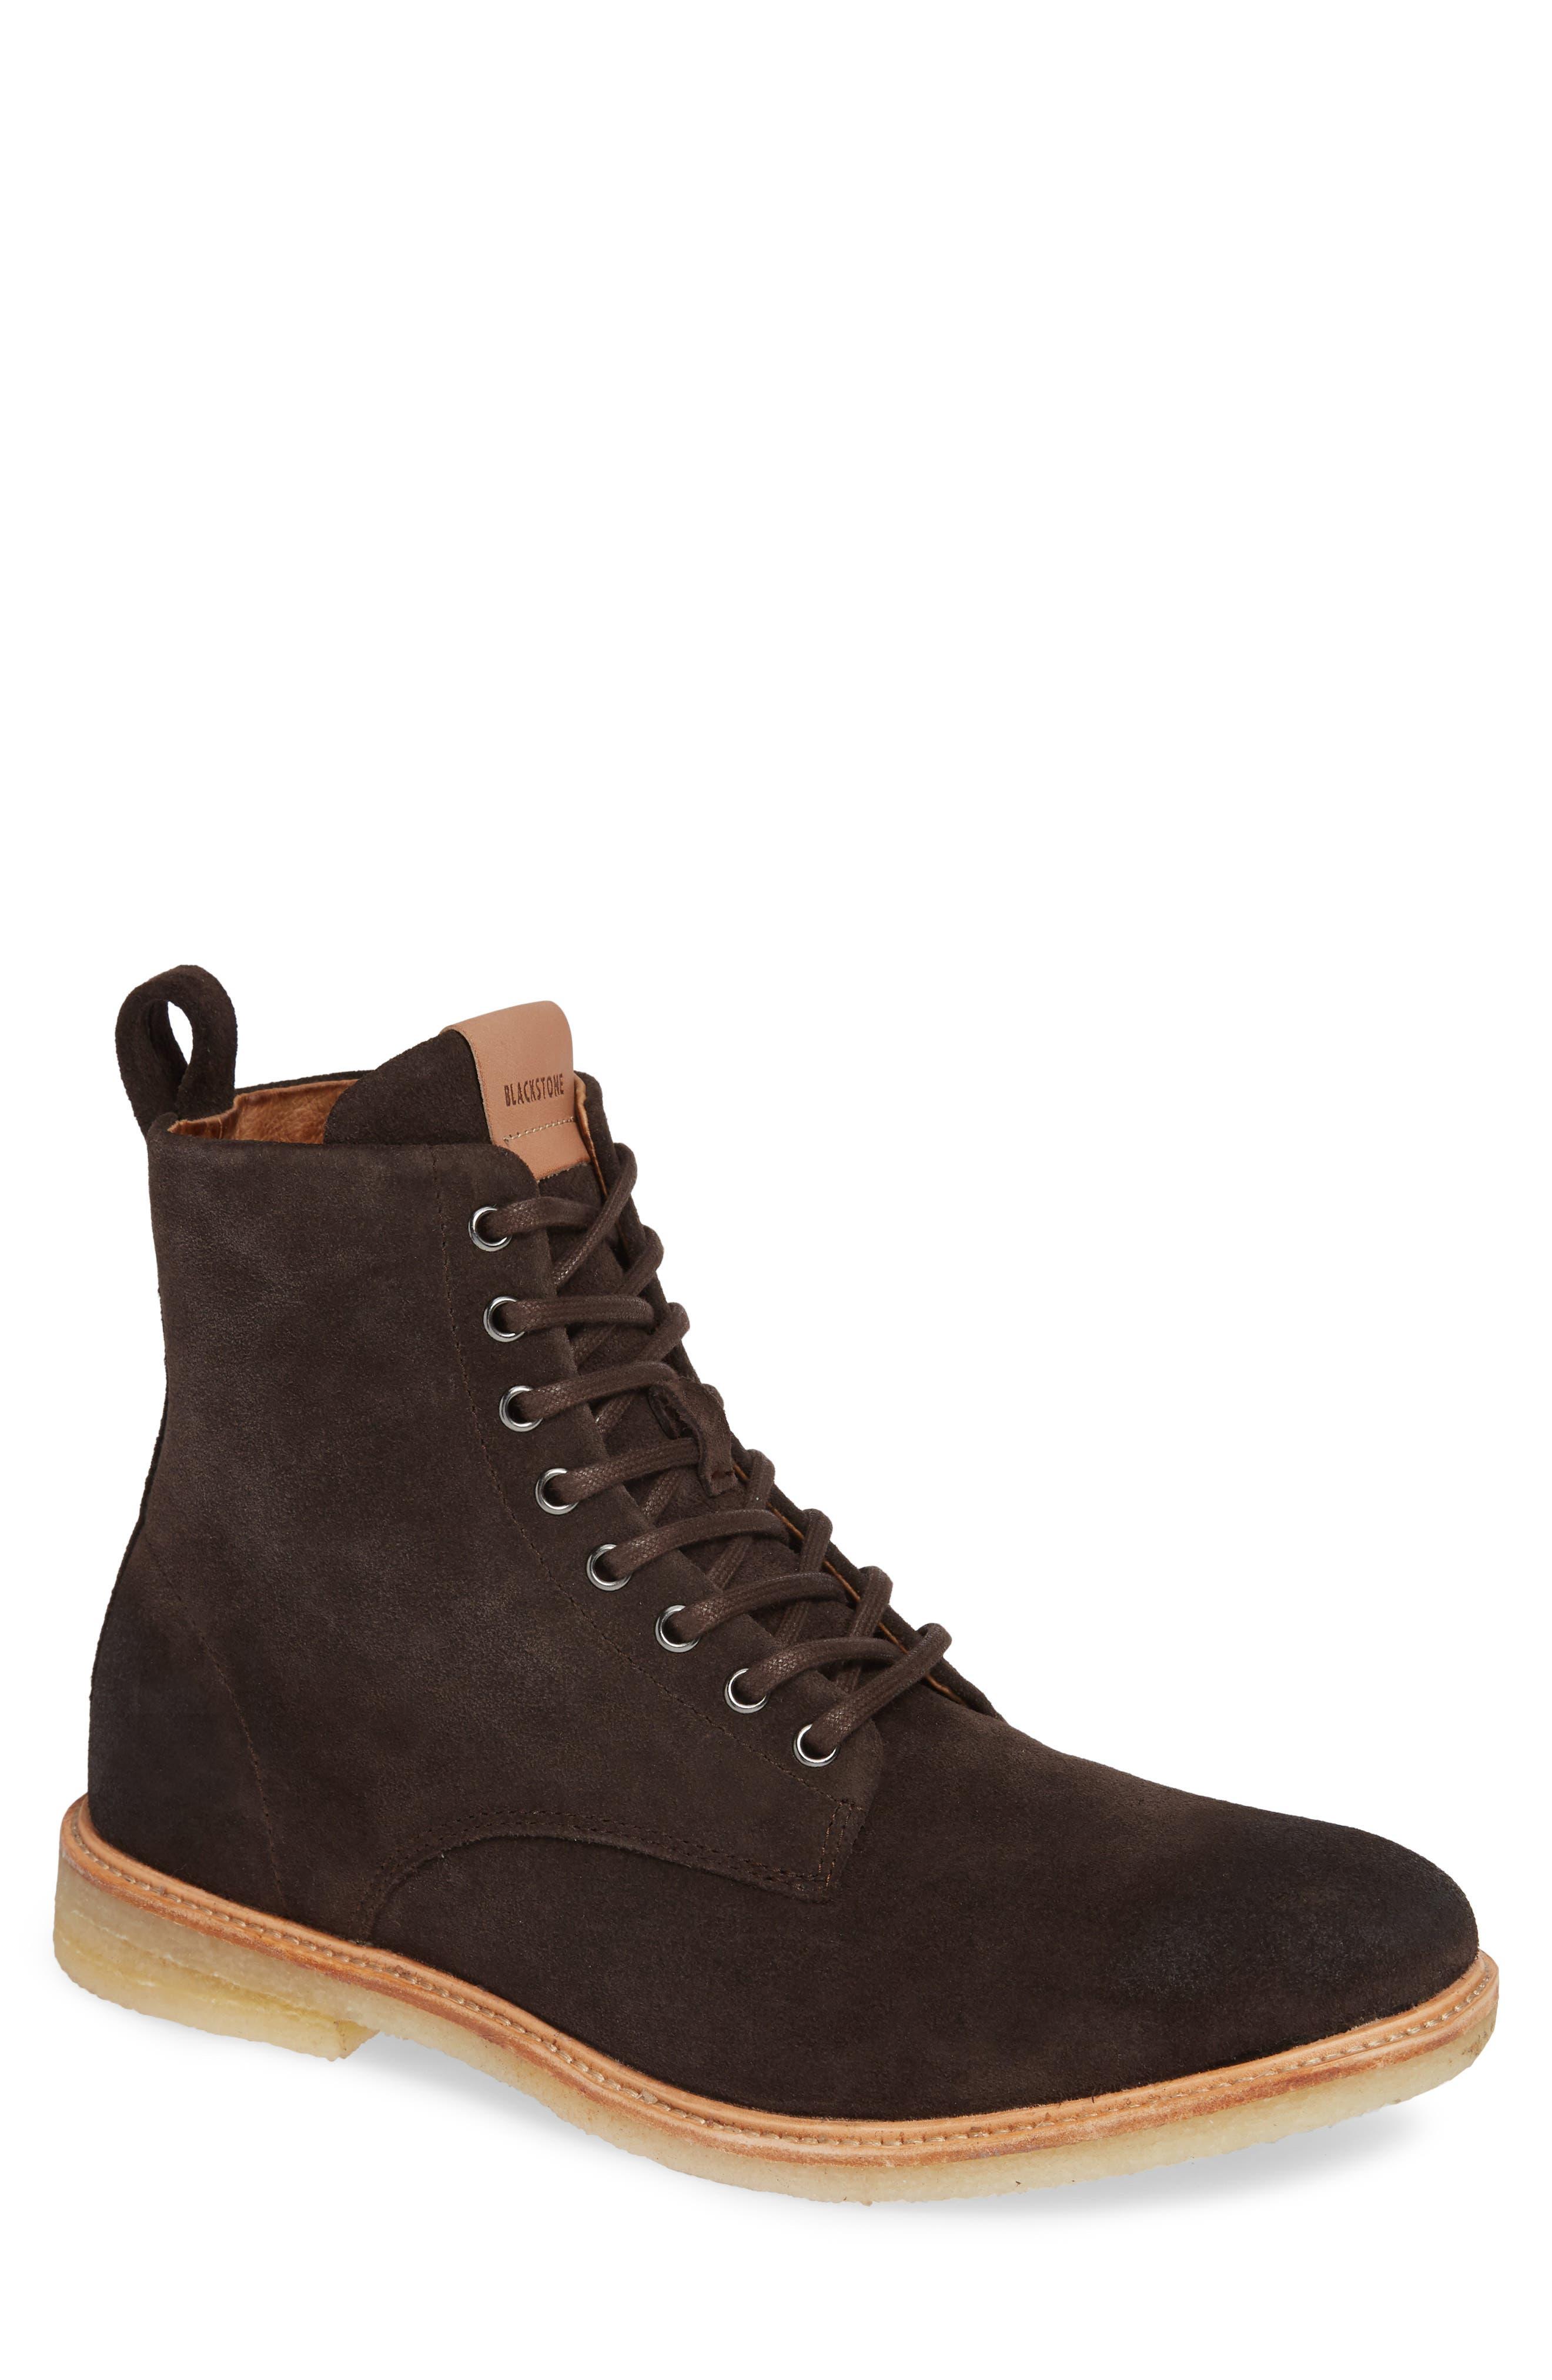 Blackstone Qm23 Plain Toe Boot, Brown